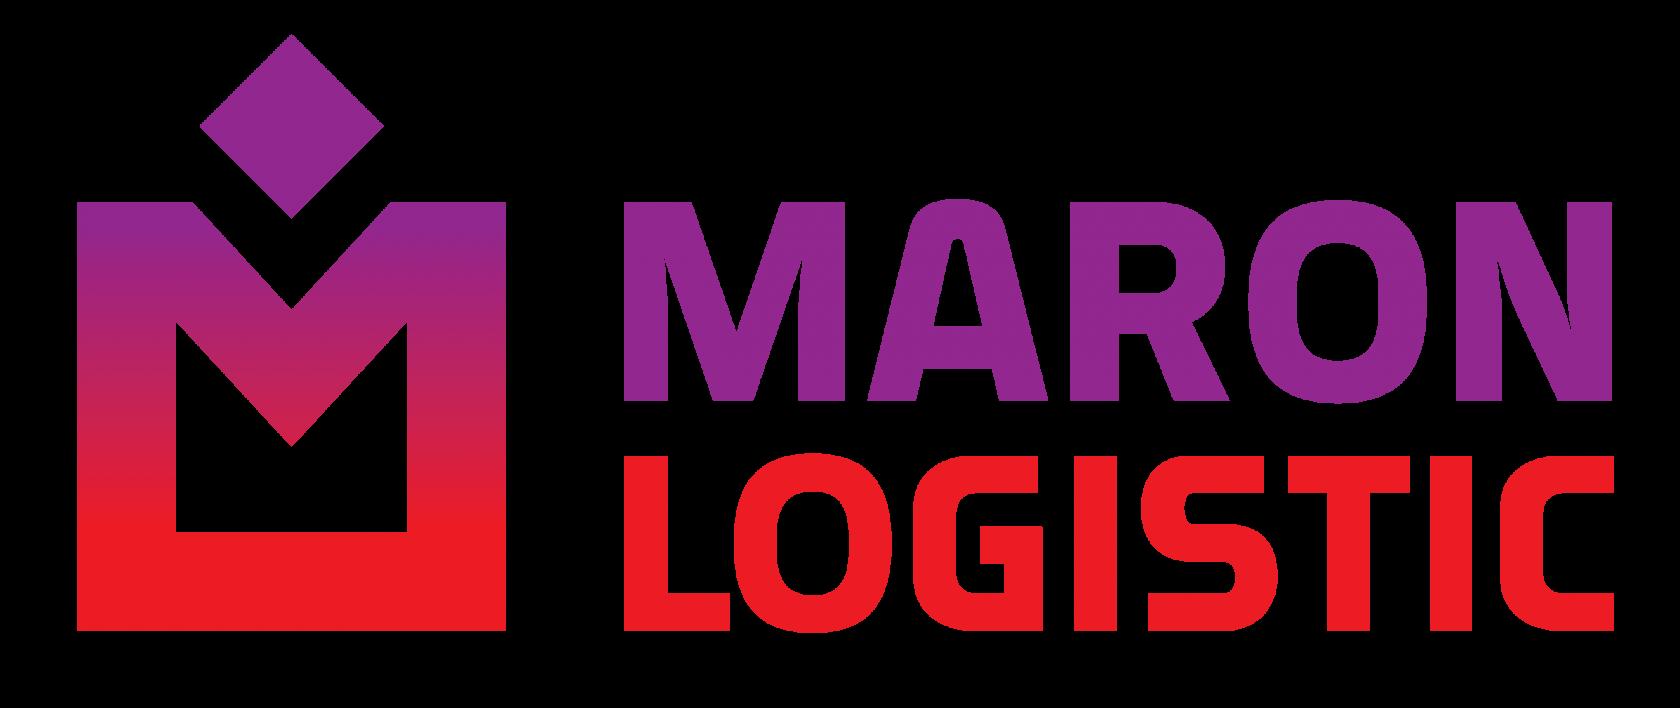 MARON LOGISTIC